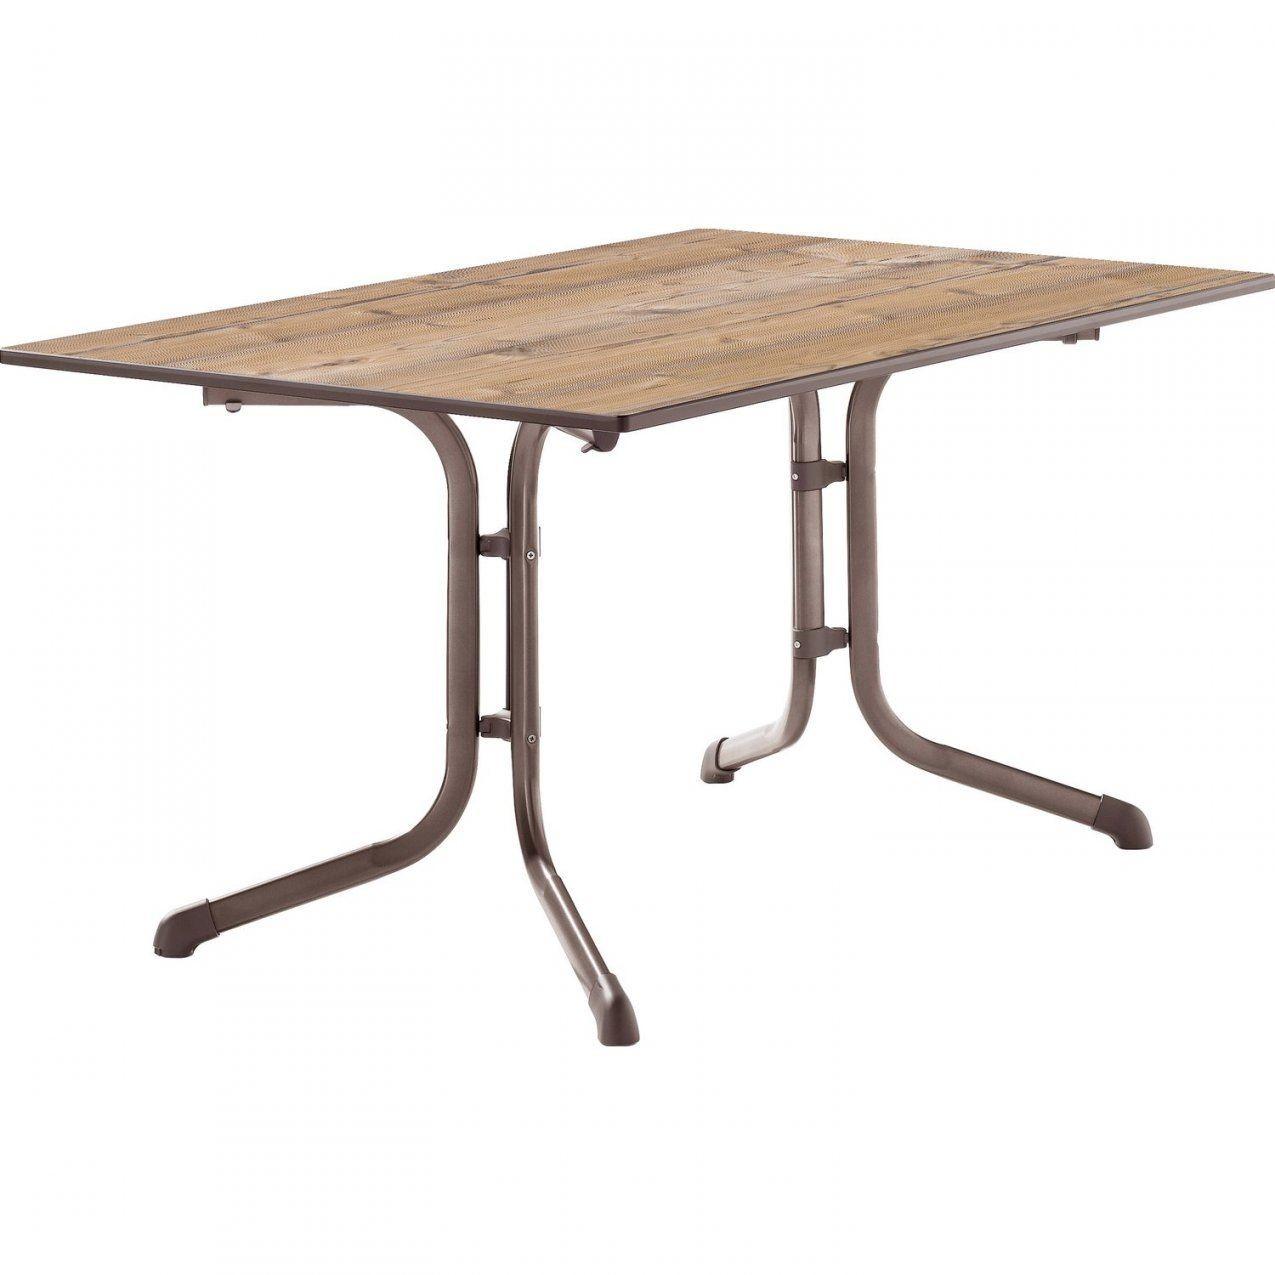 Gartentisch 100 X 80.Balkontisch 60 X 120 Interesting Deuba Alu Tisch Holzoptik